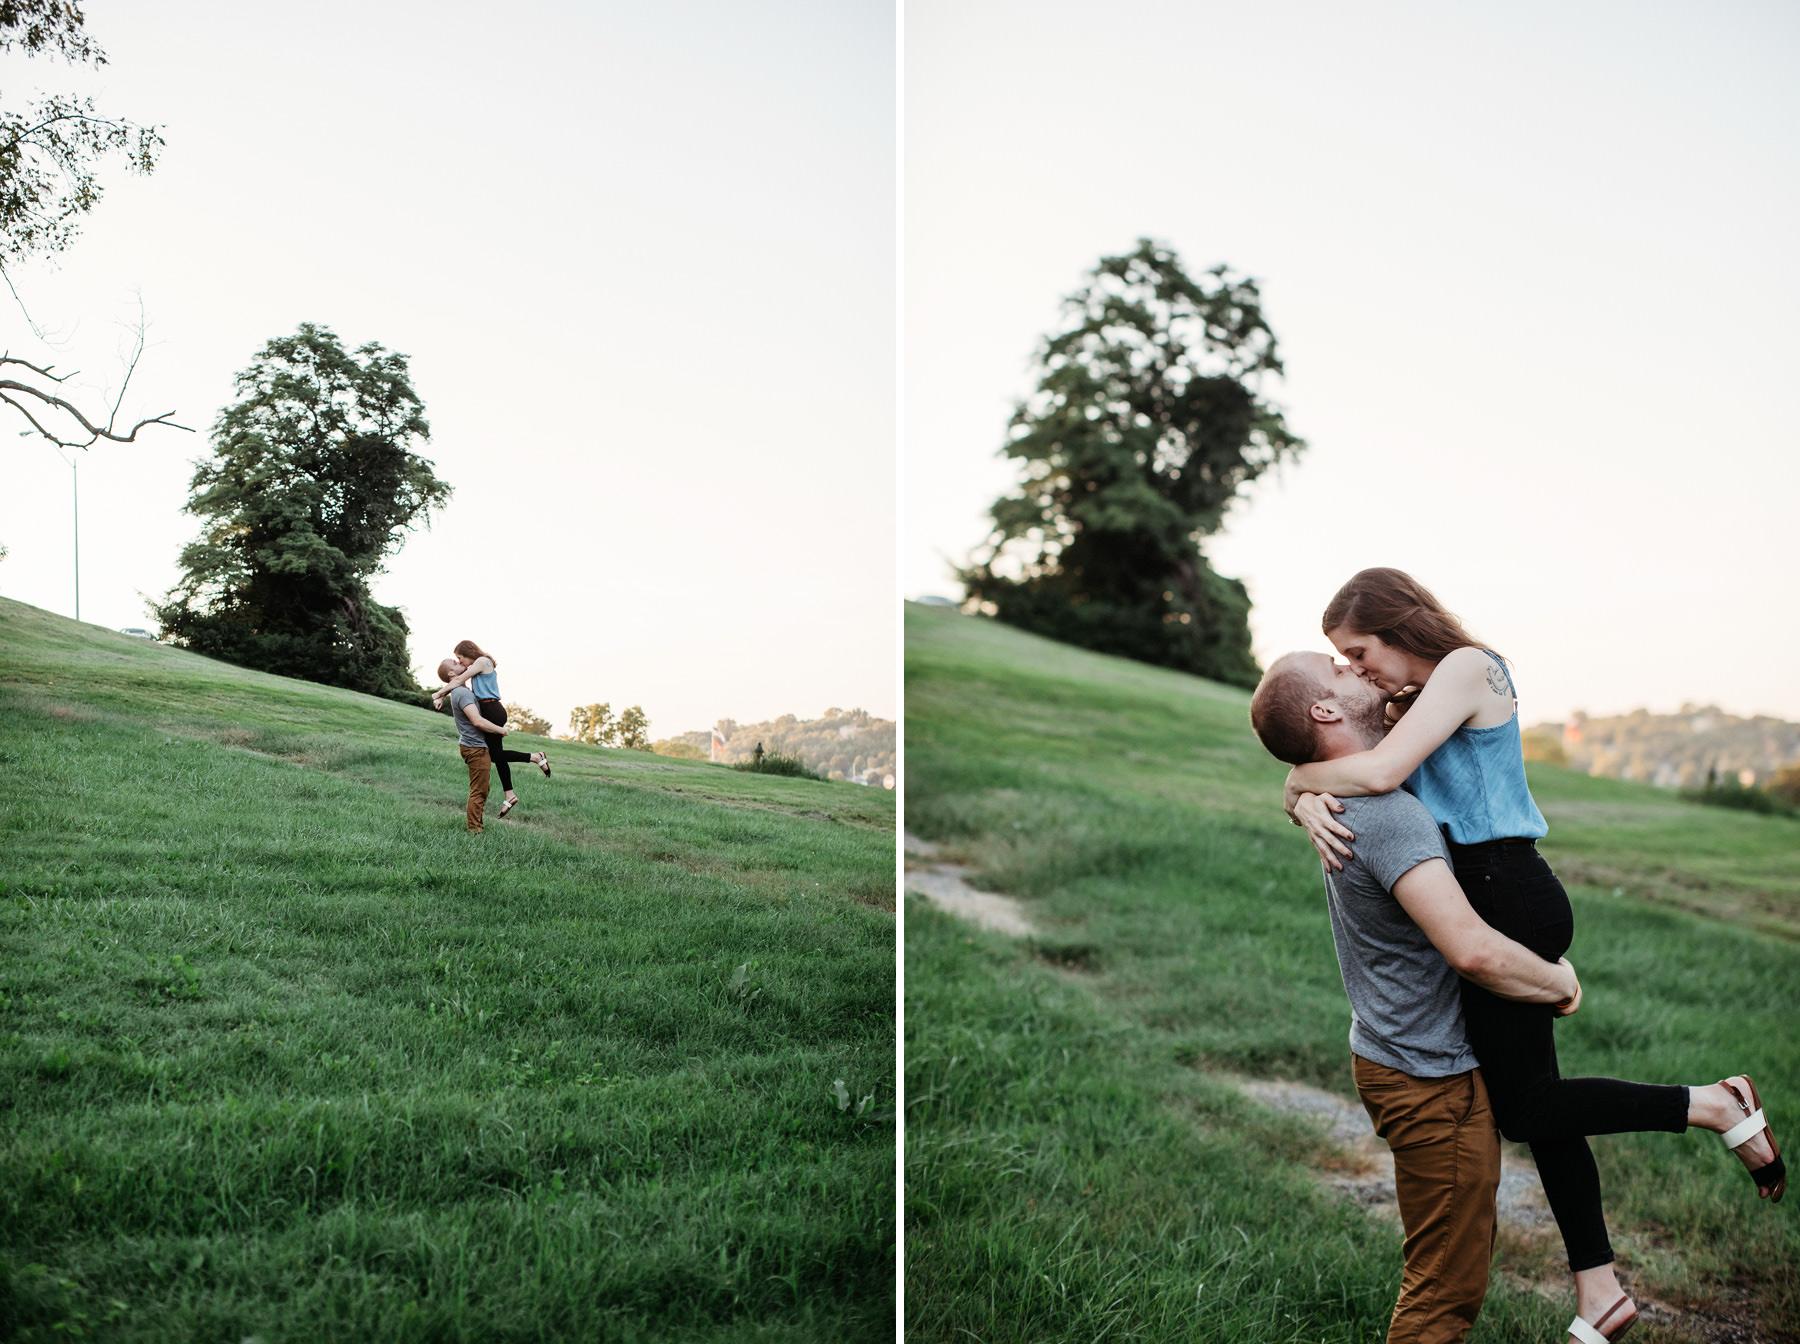 Kansas City_Penn Valley Park_Engagement Session_Kindling Wedding Photography31.JPG